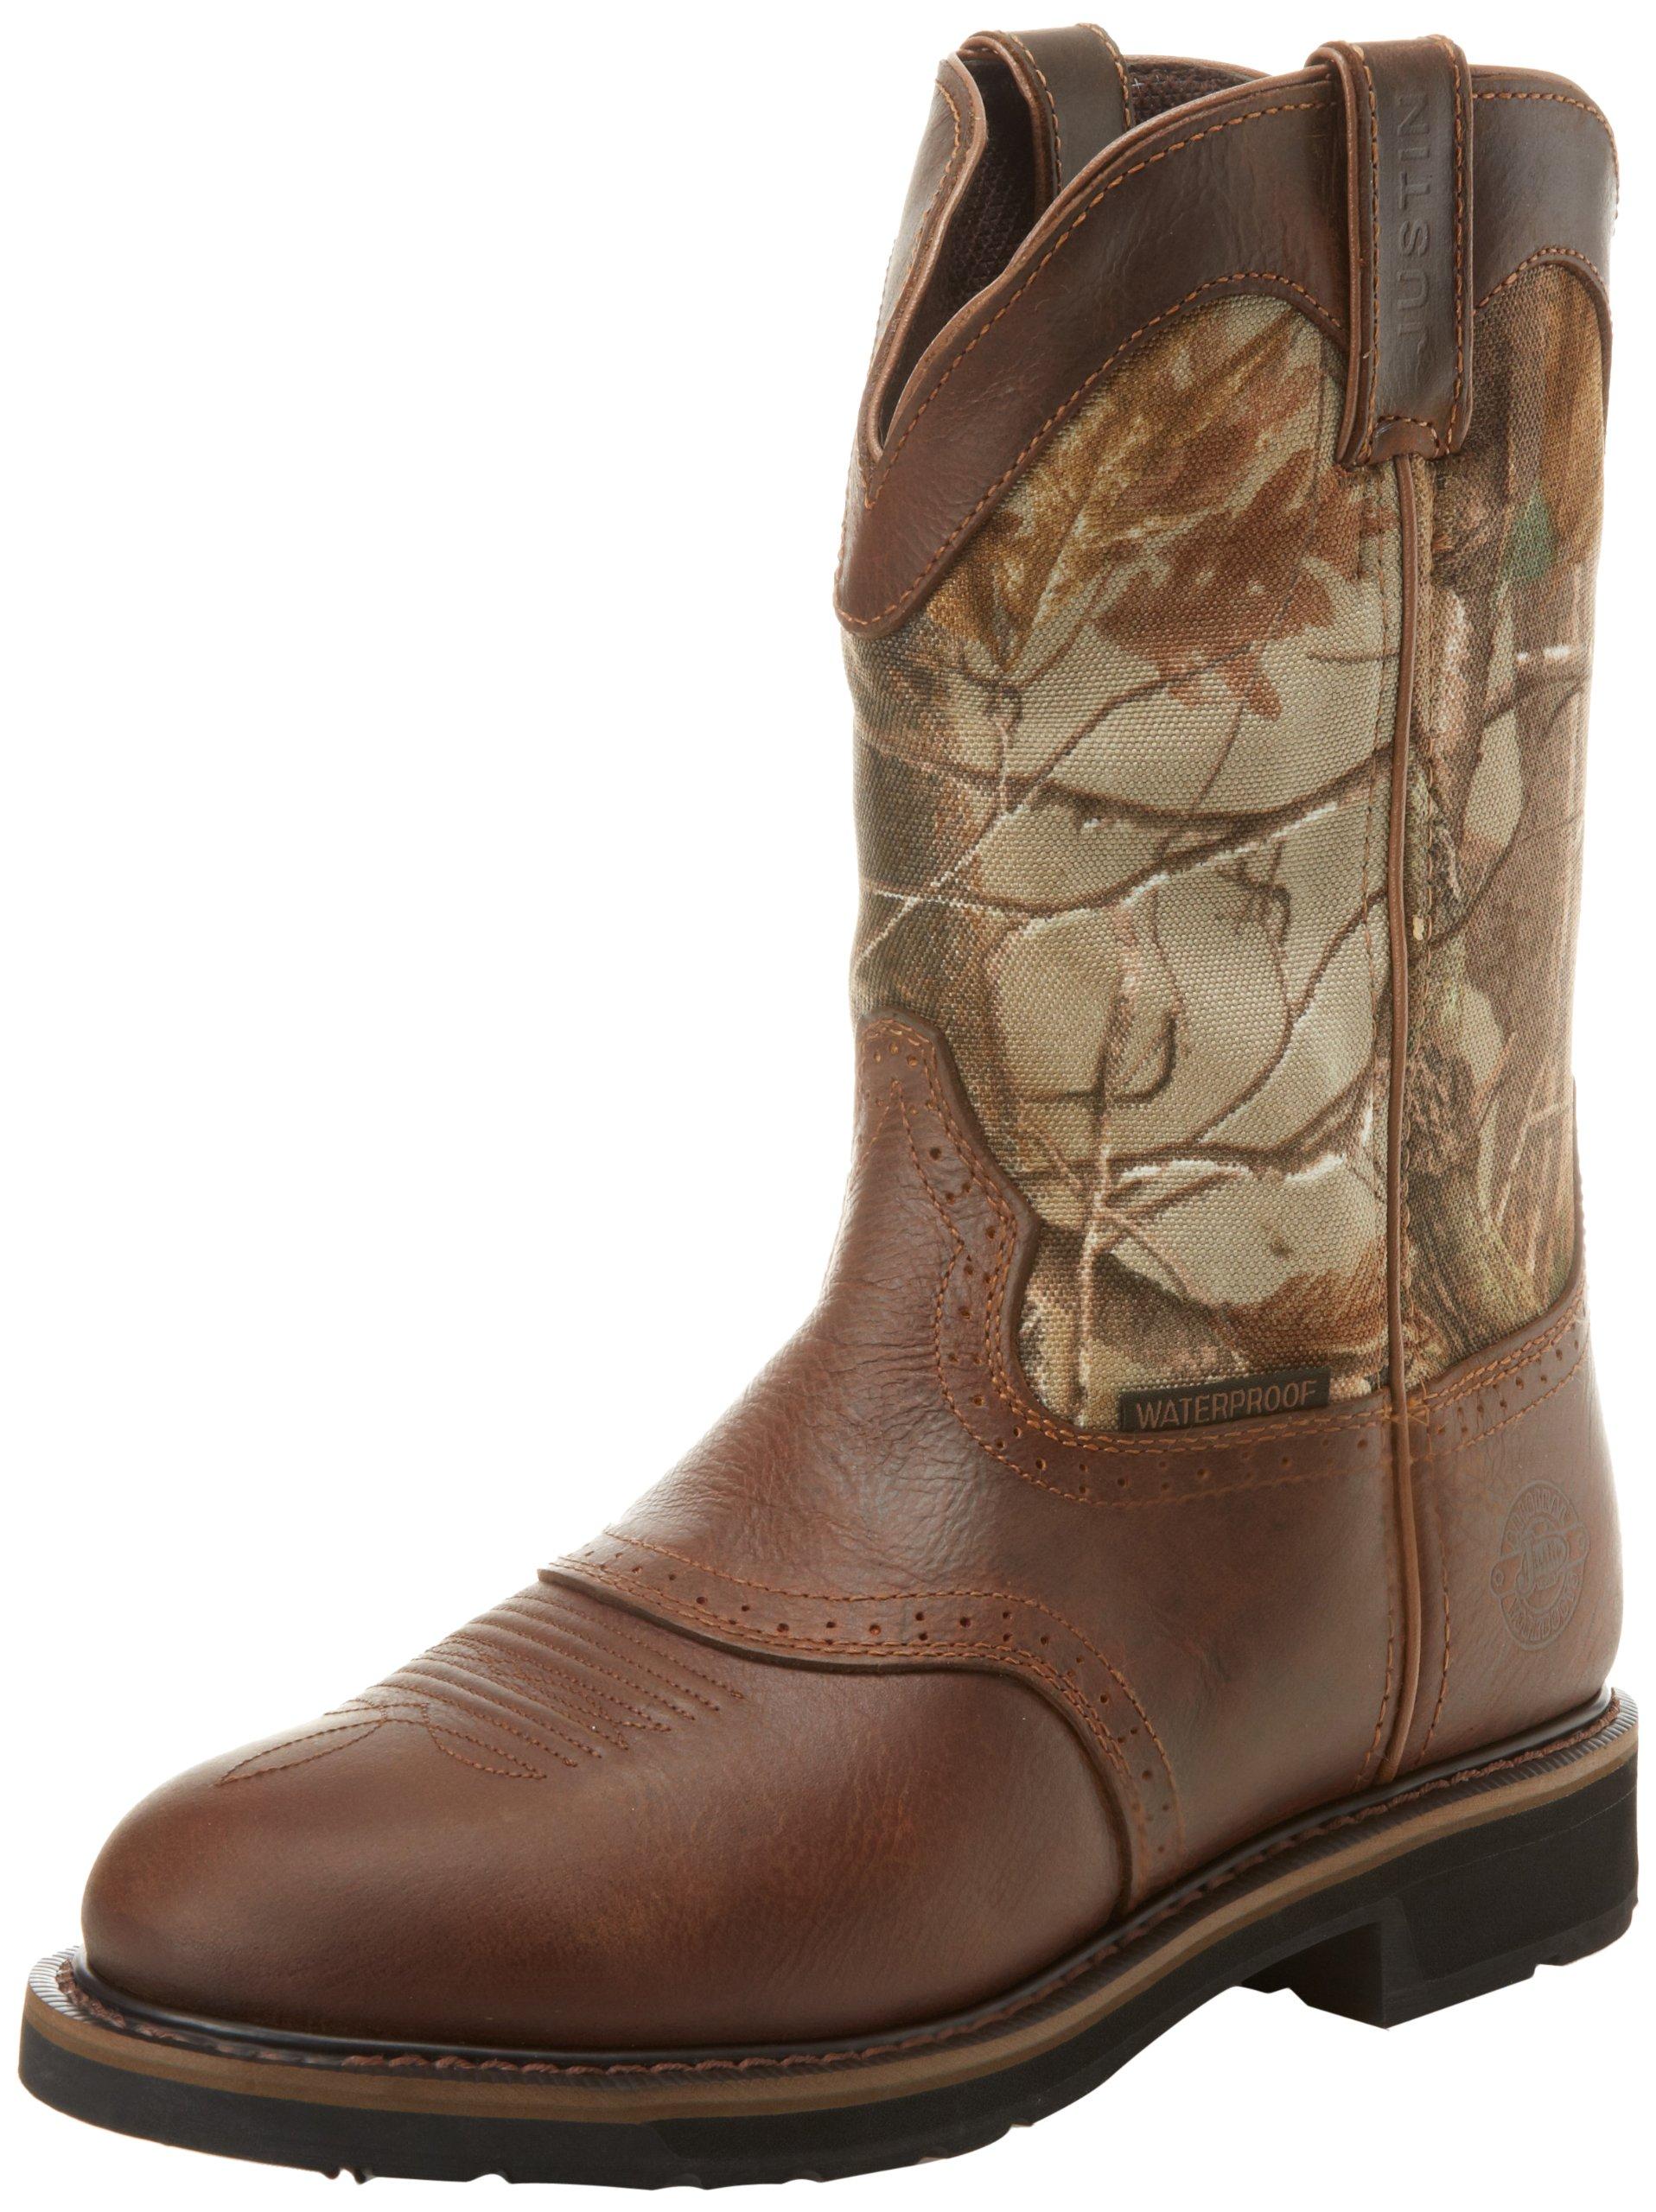 Justin Original Work Boots Men's Stampede Camo WaterProof Wk Work Boot,Rugged Tan/Real Tree Camo,8.5 D US